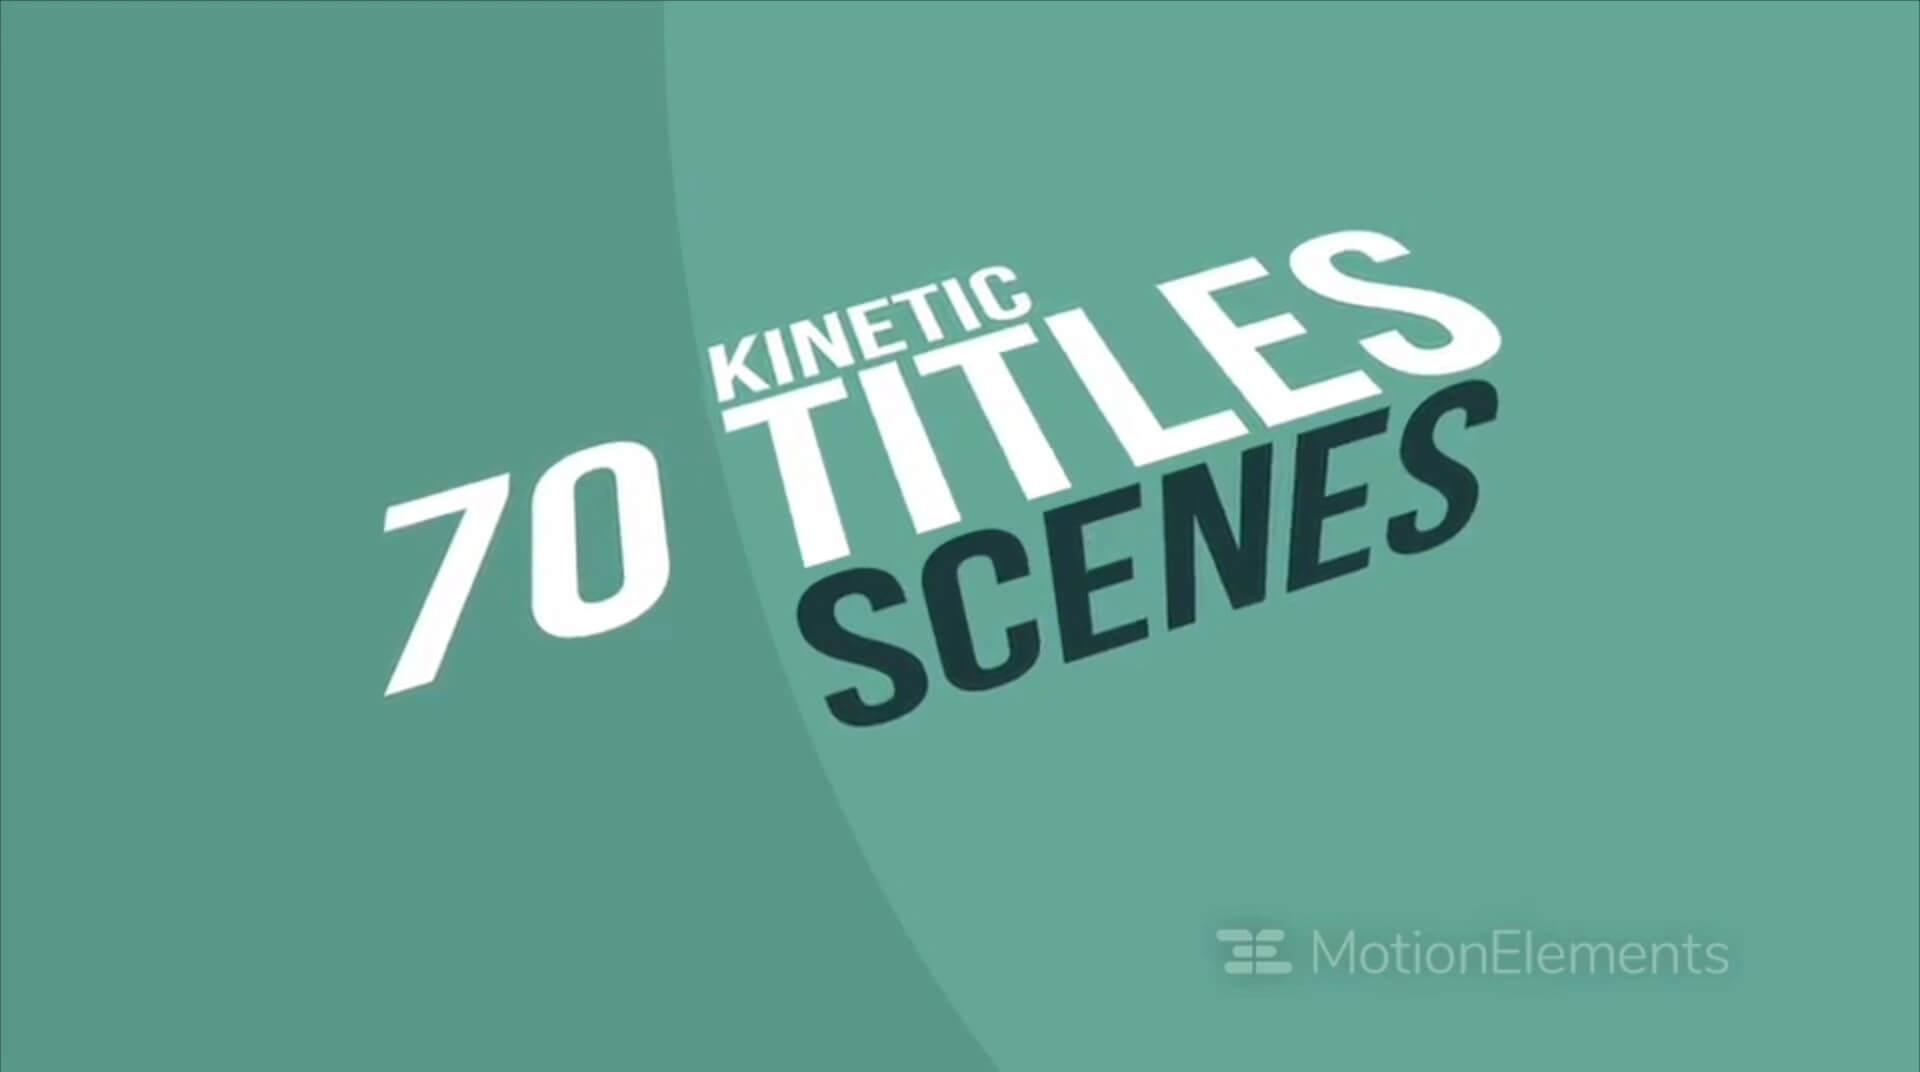 Fcpx文字排版动画 70个滚动翻转文字标题模板 支持中文 Kinetic Titles Scenes